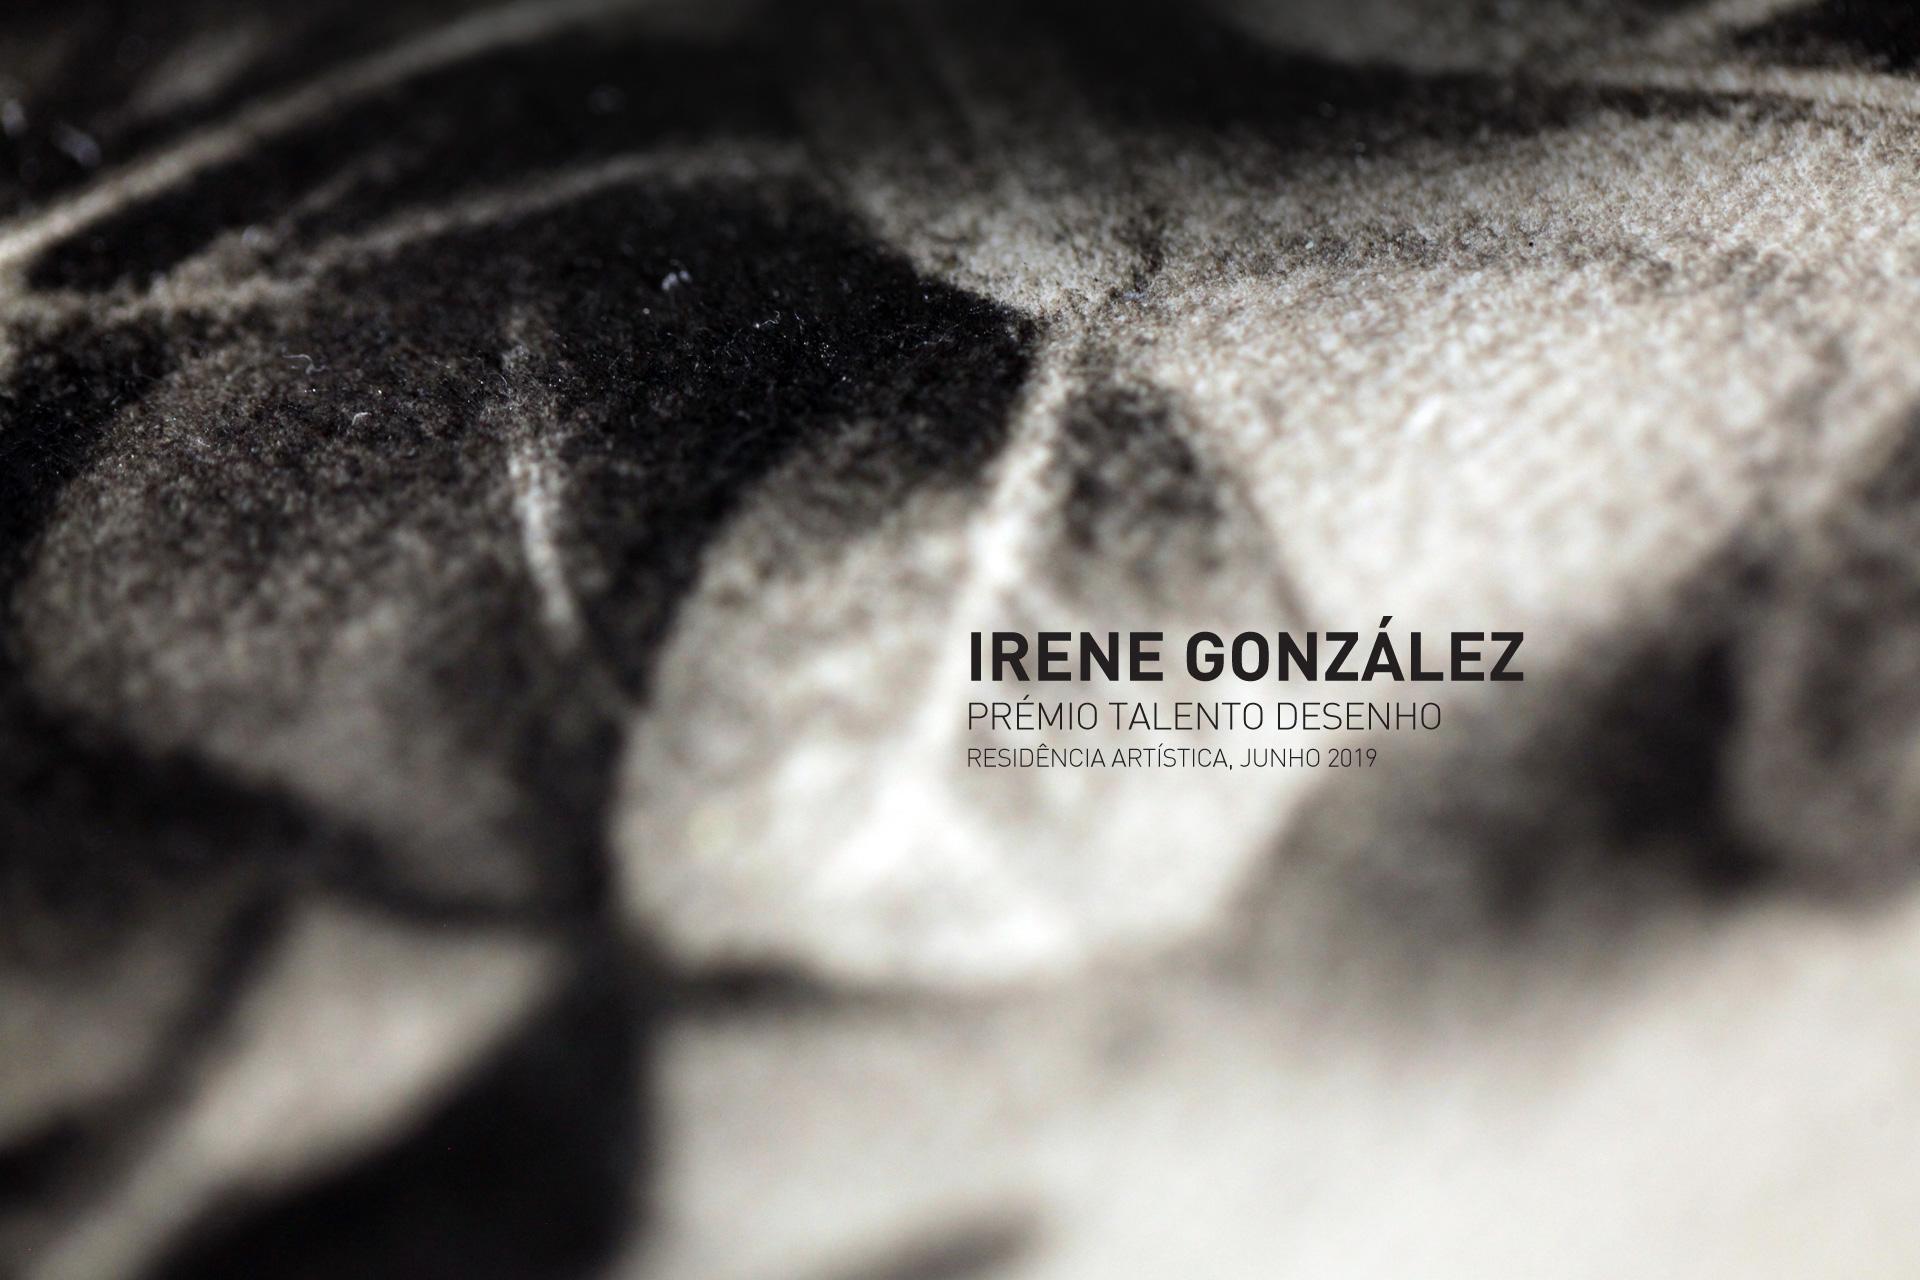 Irene Gonzalez